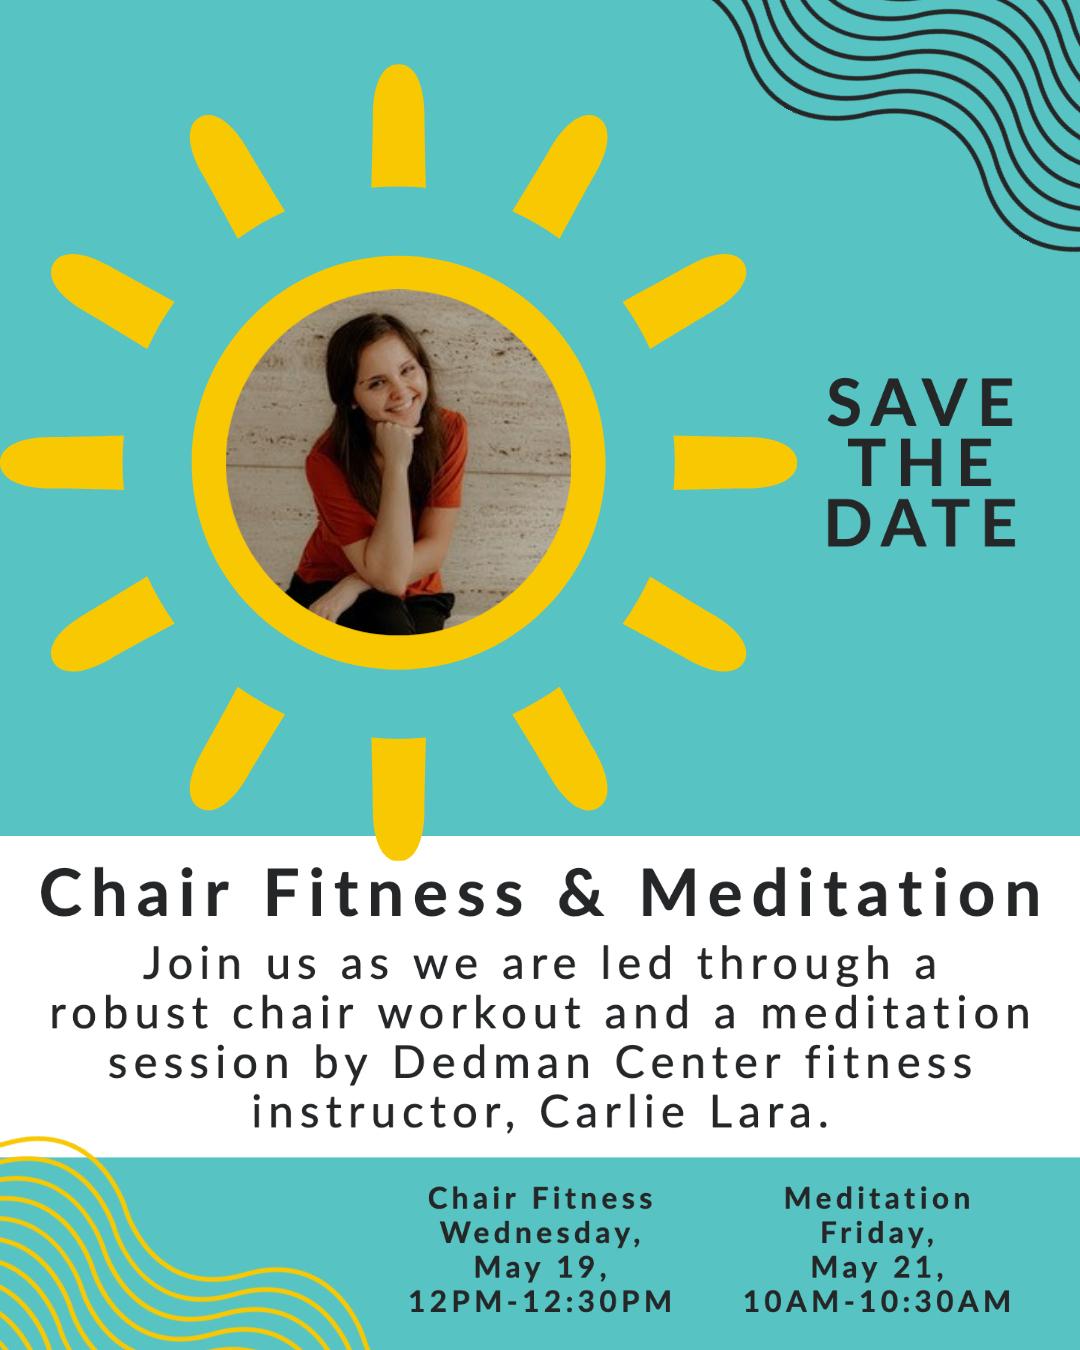 SMUSA STAFF APPRECIATION WEEK: Meditation with Carlie Lara